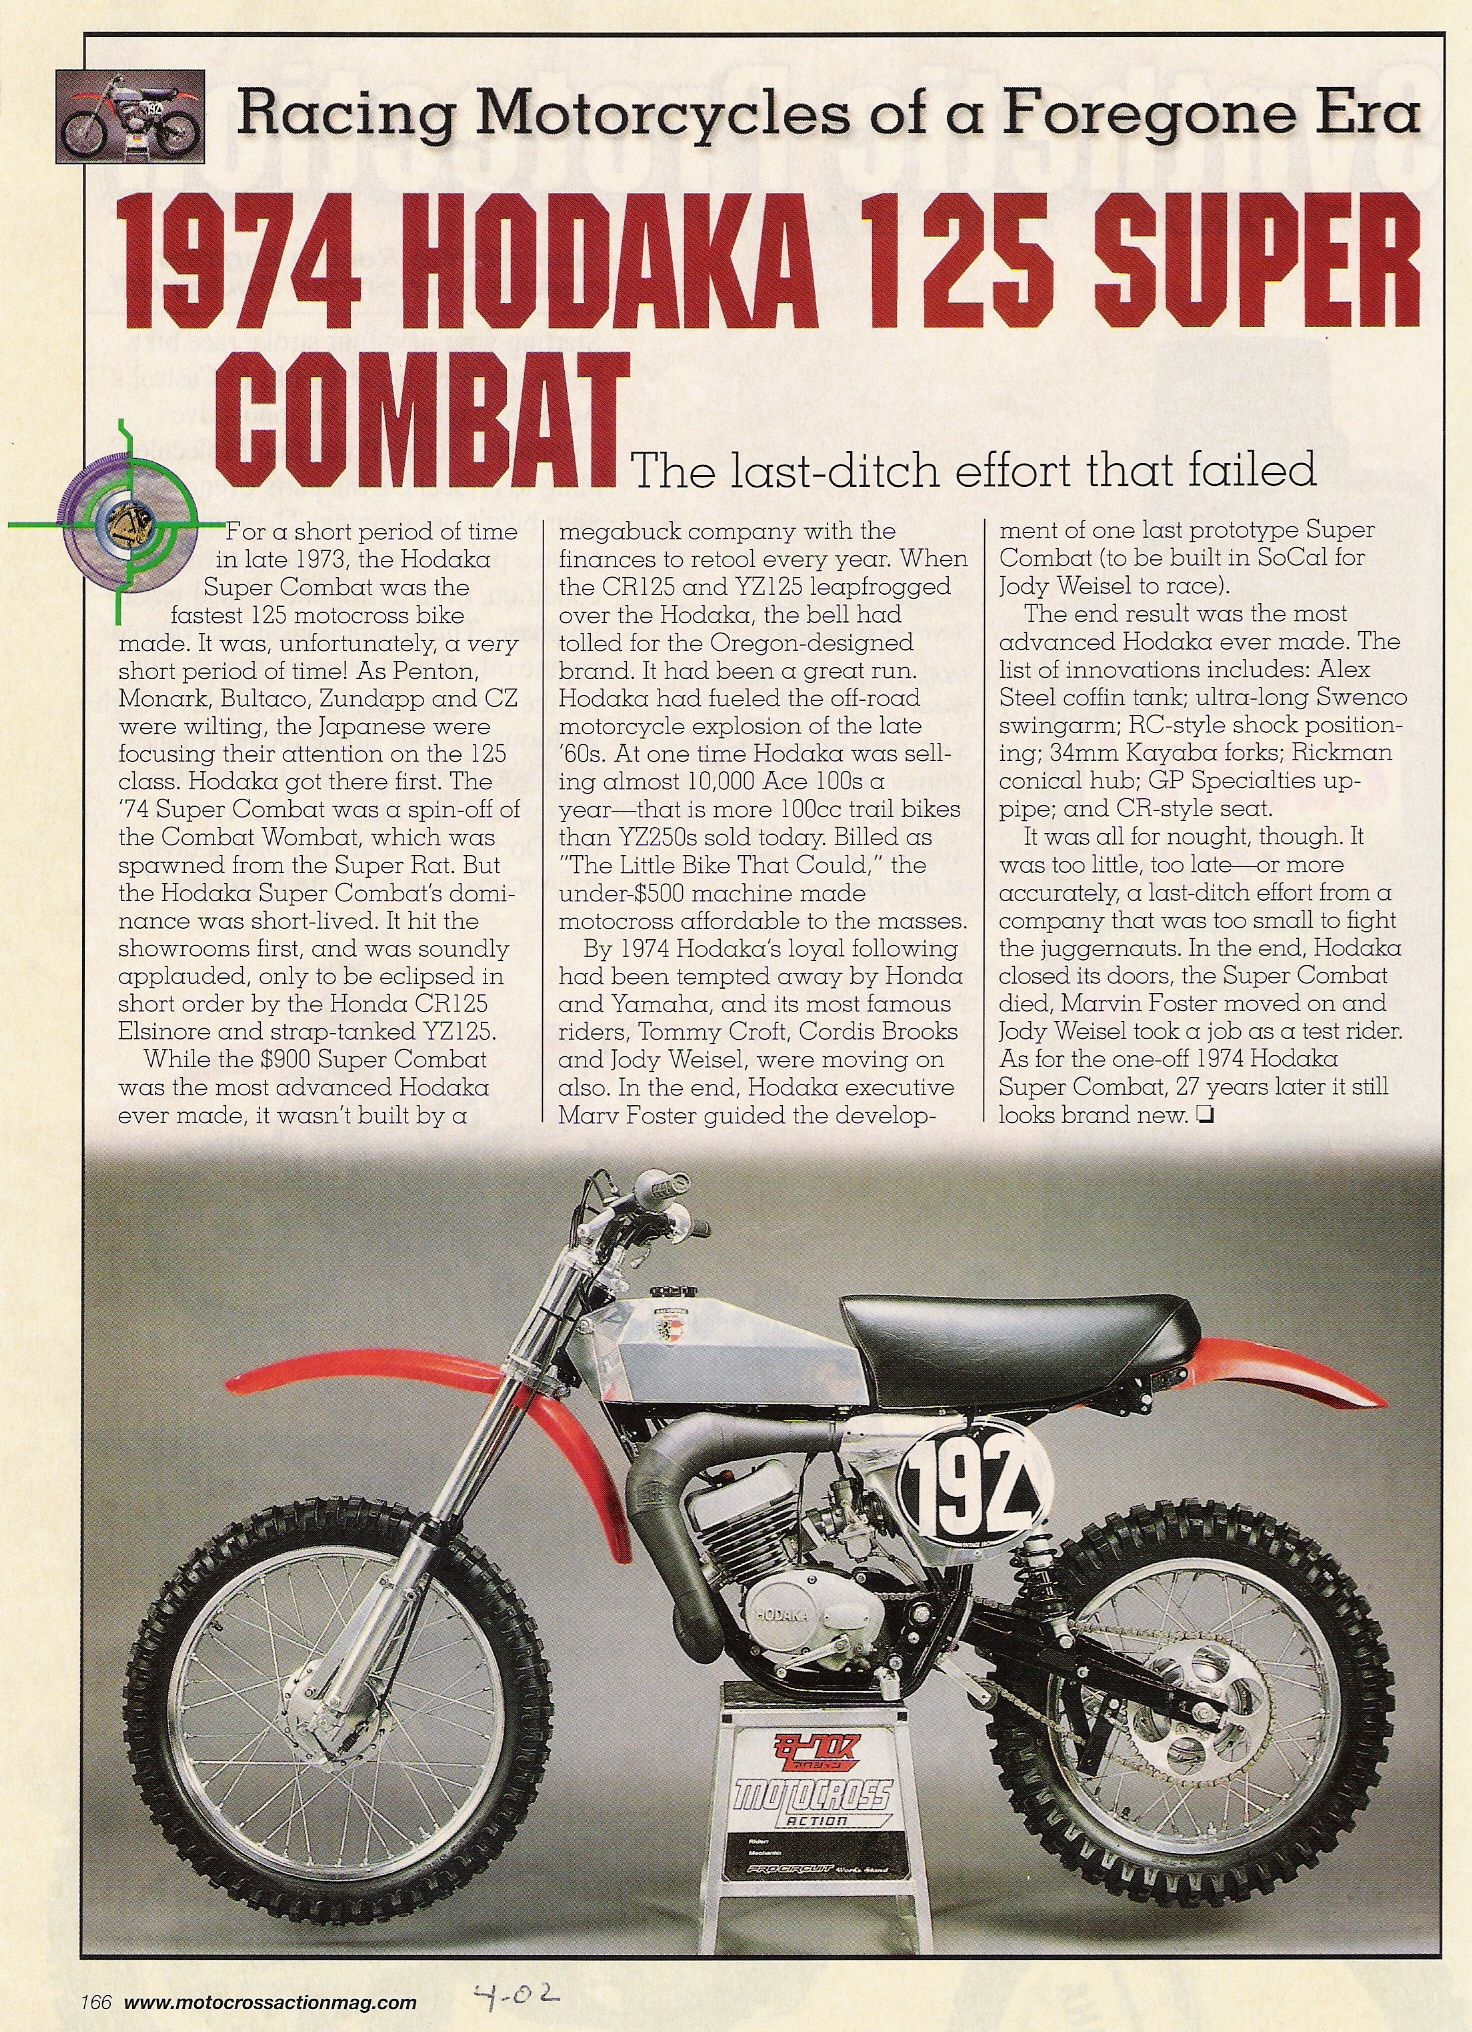 Hodaka Motorcycle Dirt Bike Vintage Honda Motorcycles Motocross Bikes